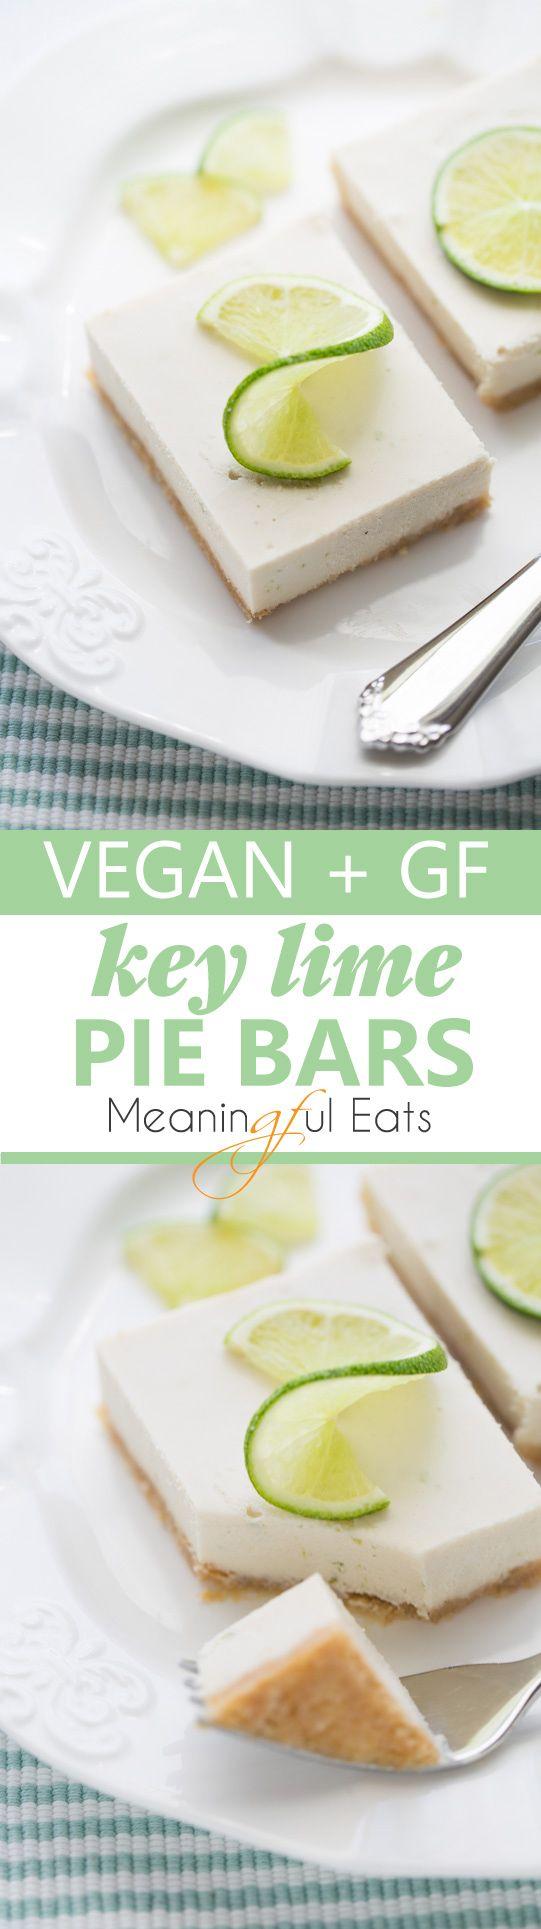 Vegan & Gluten-Free Key Lime Pie Bars! Creamy, tart and so easy to make!